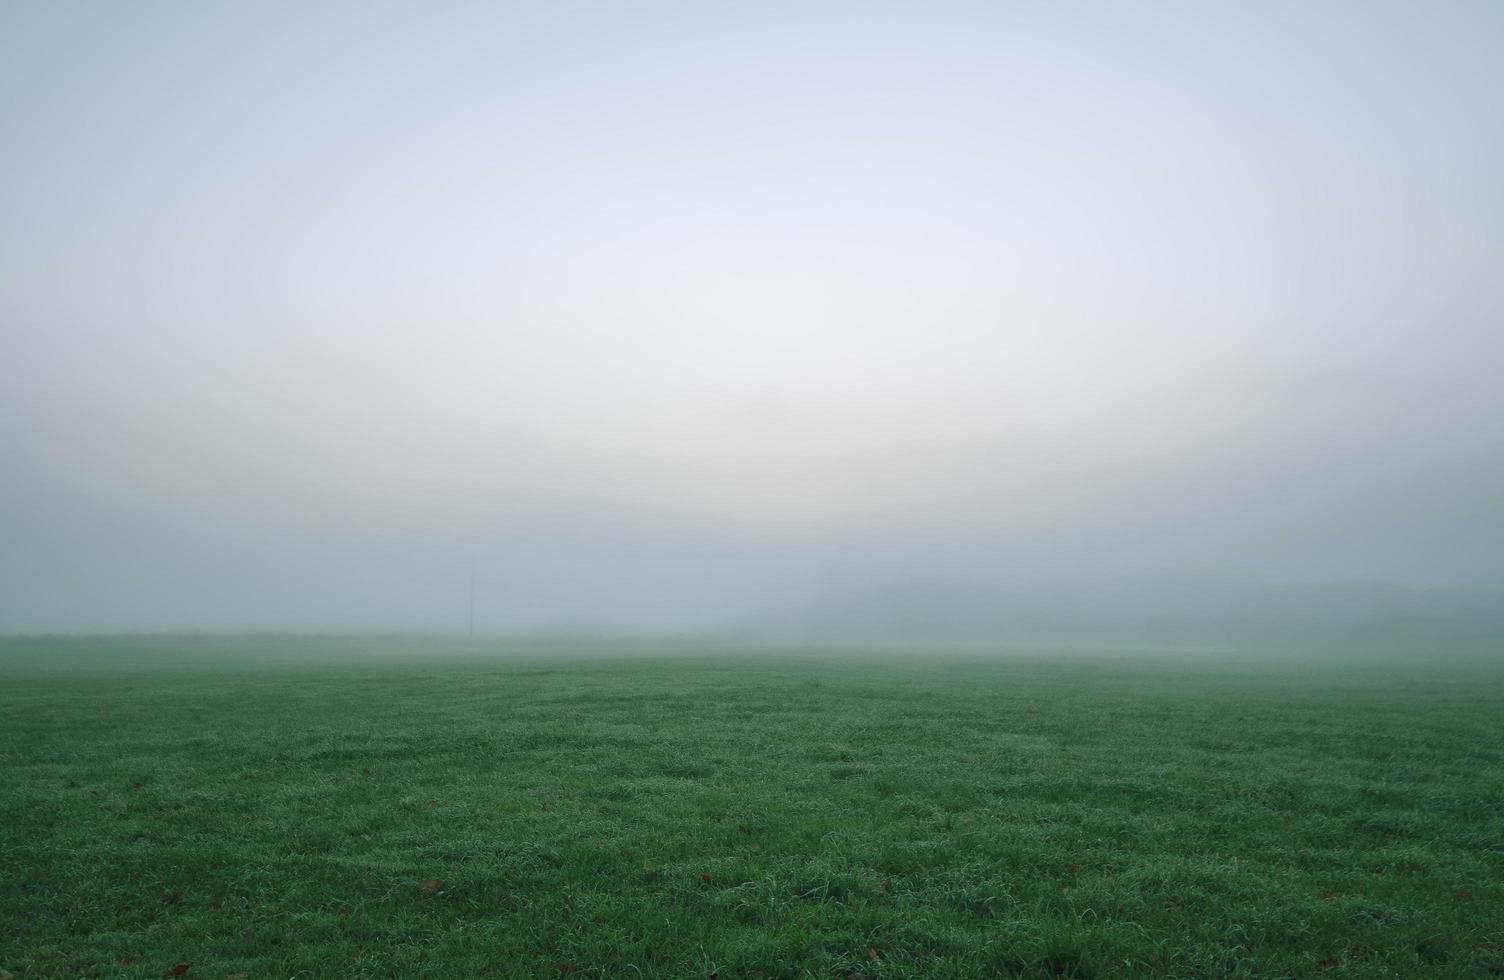 nebliges grünes Grasfeld foto